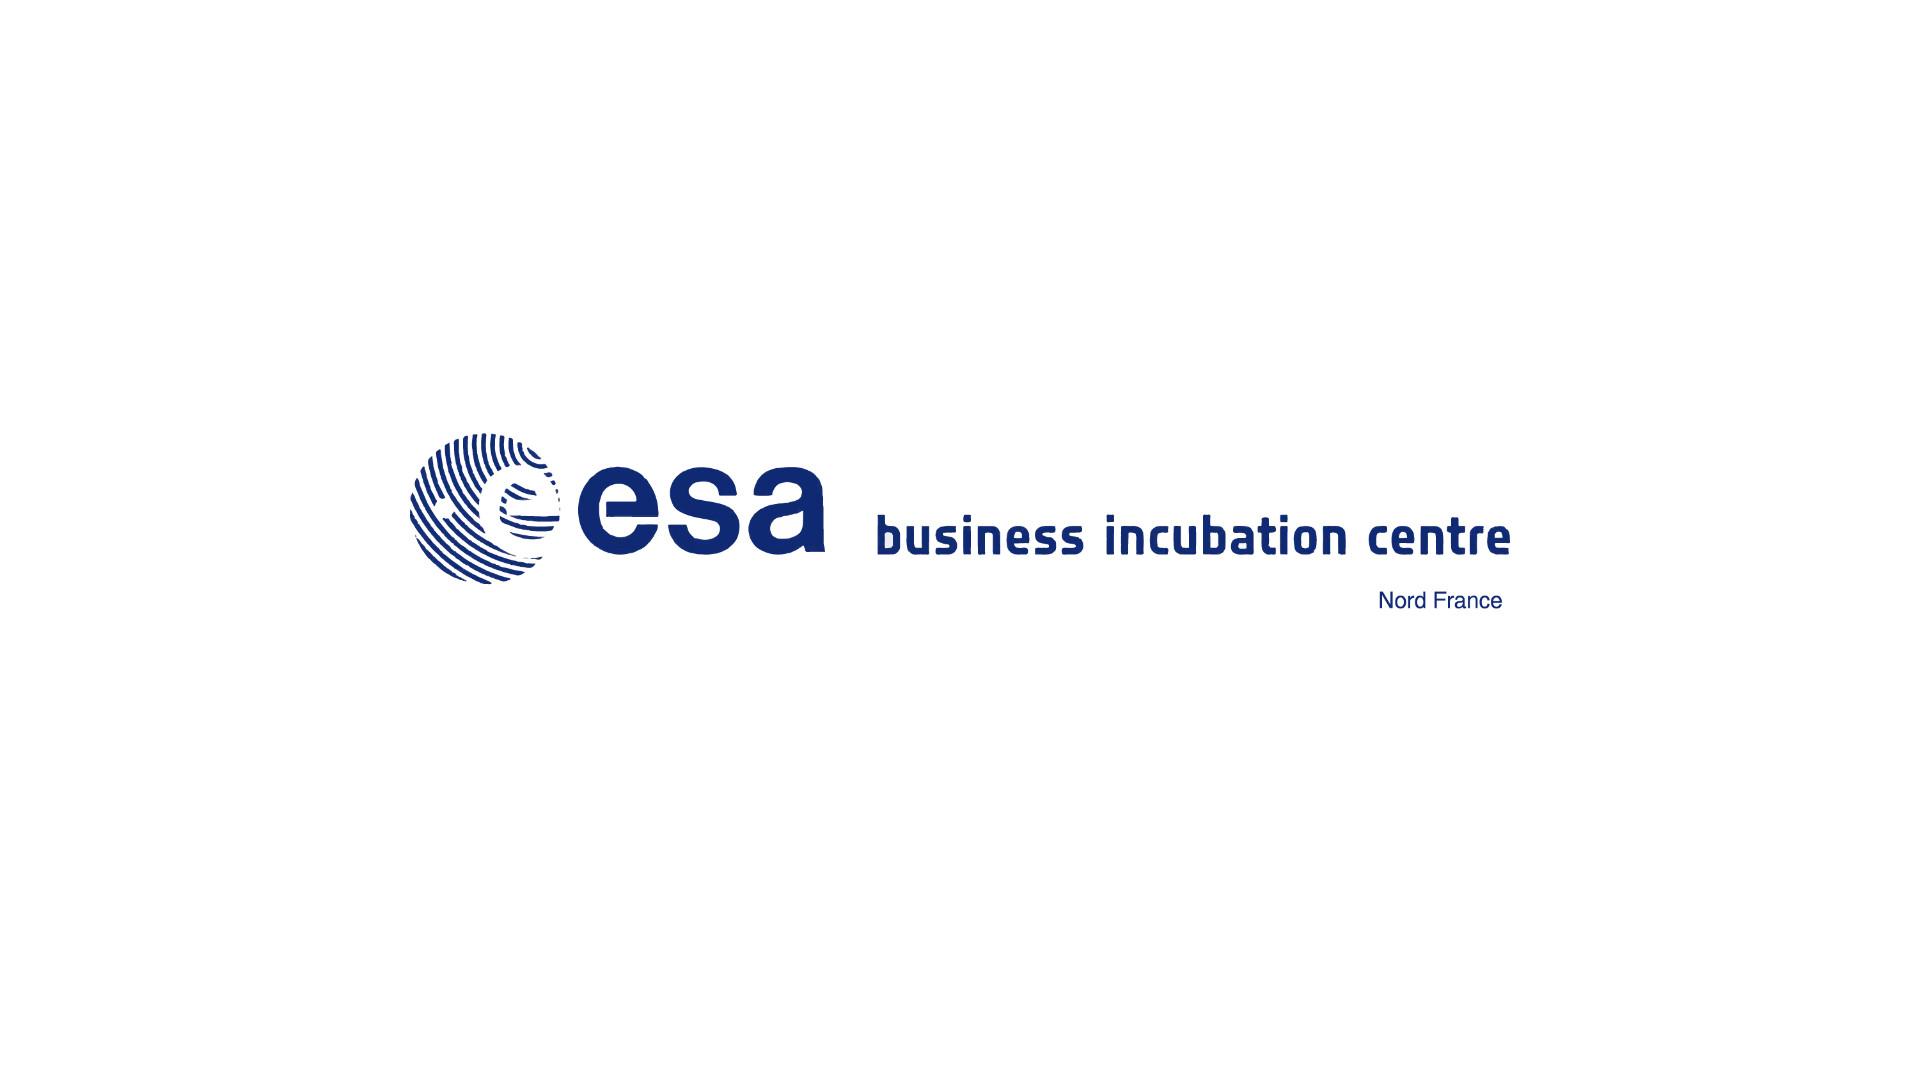 European Space Agency - Incubation